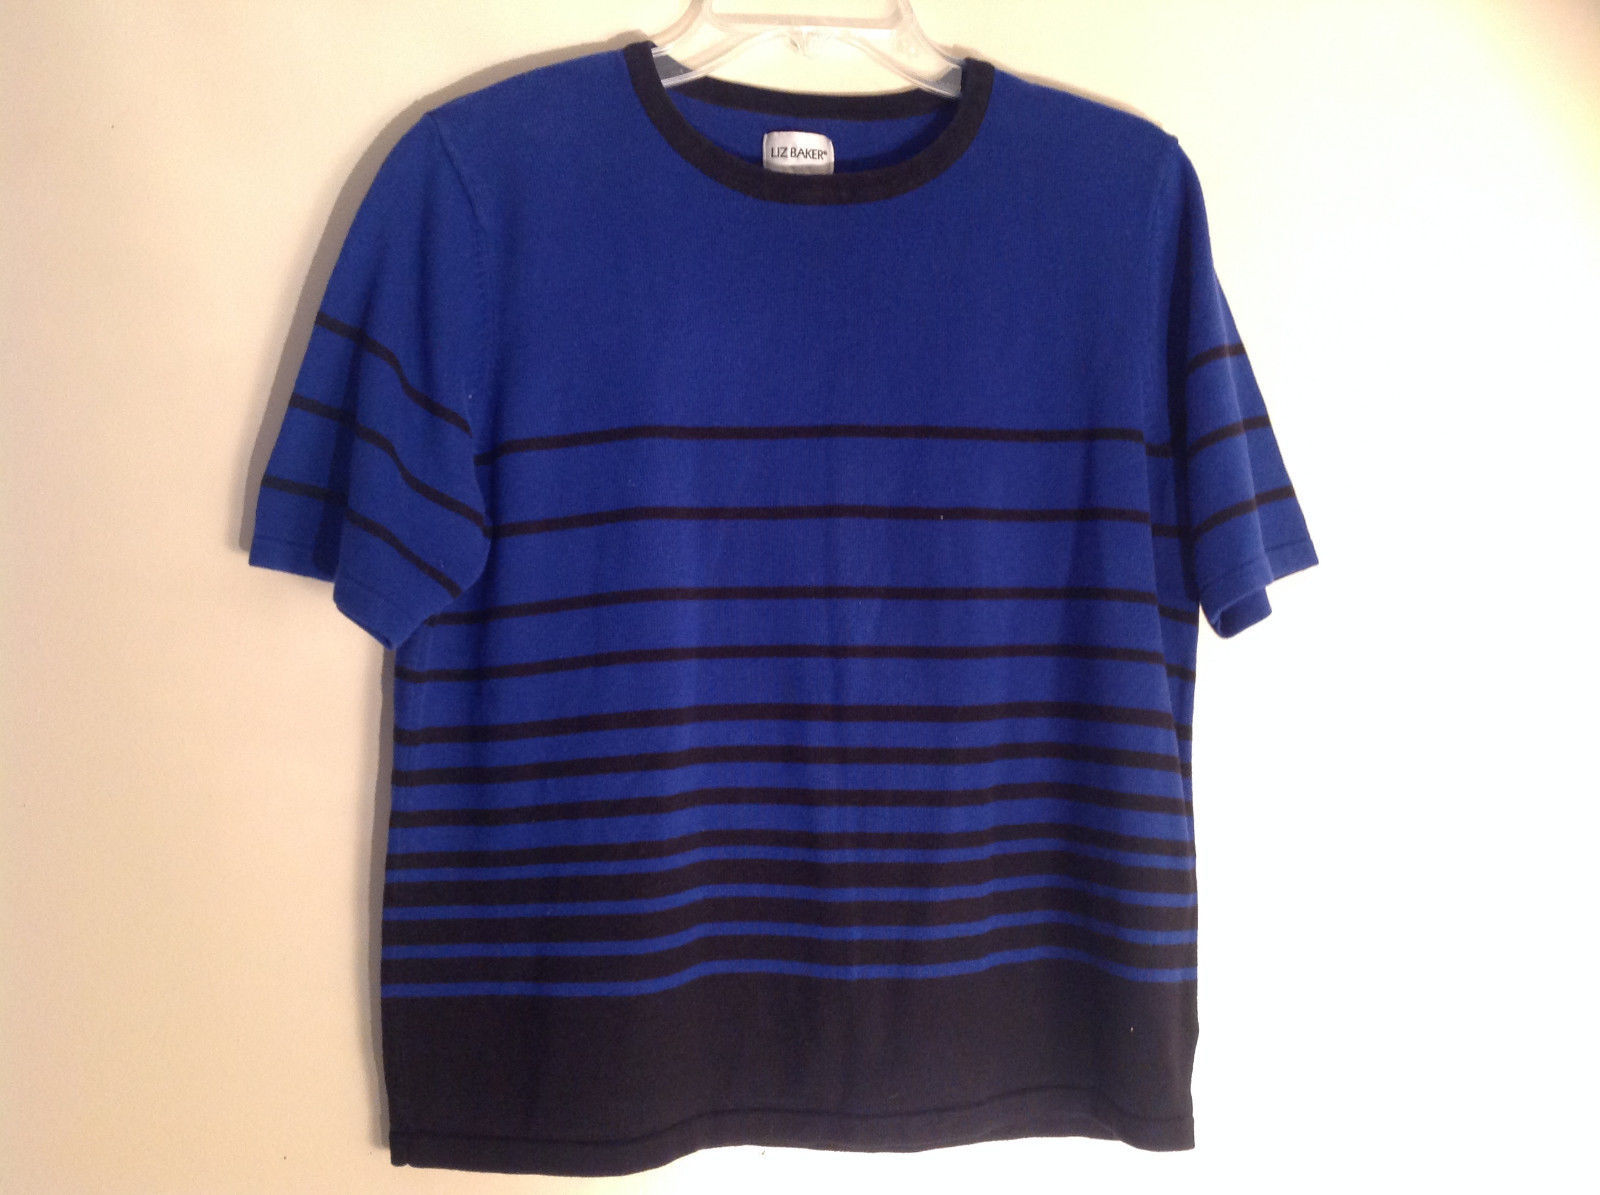 Liz Baker Blue Black Striped Short Sleeve Shirt Crew Neckline Size Large